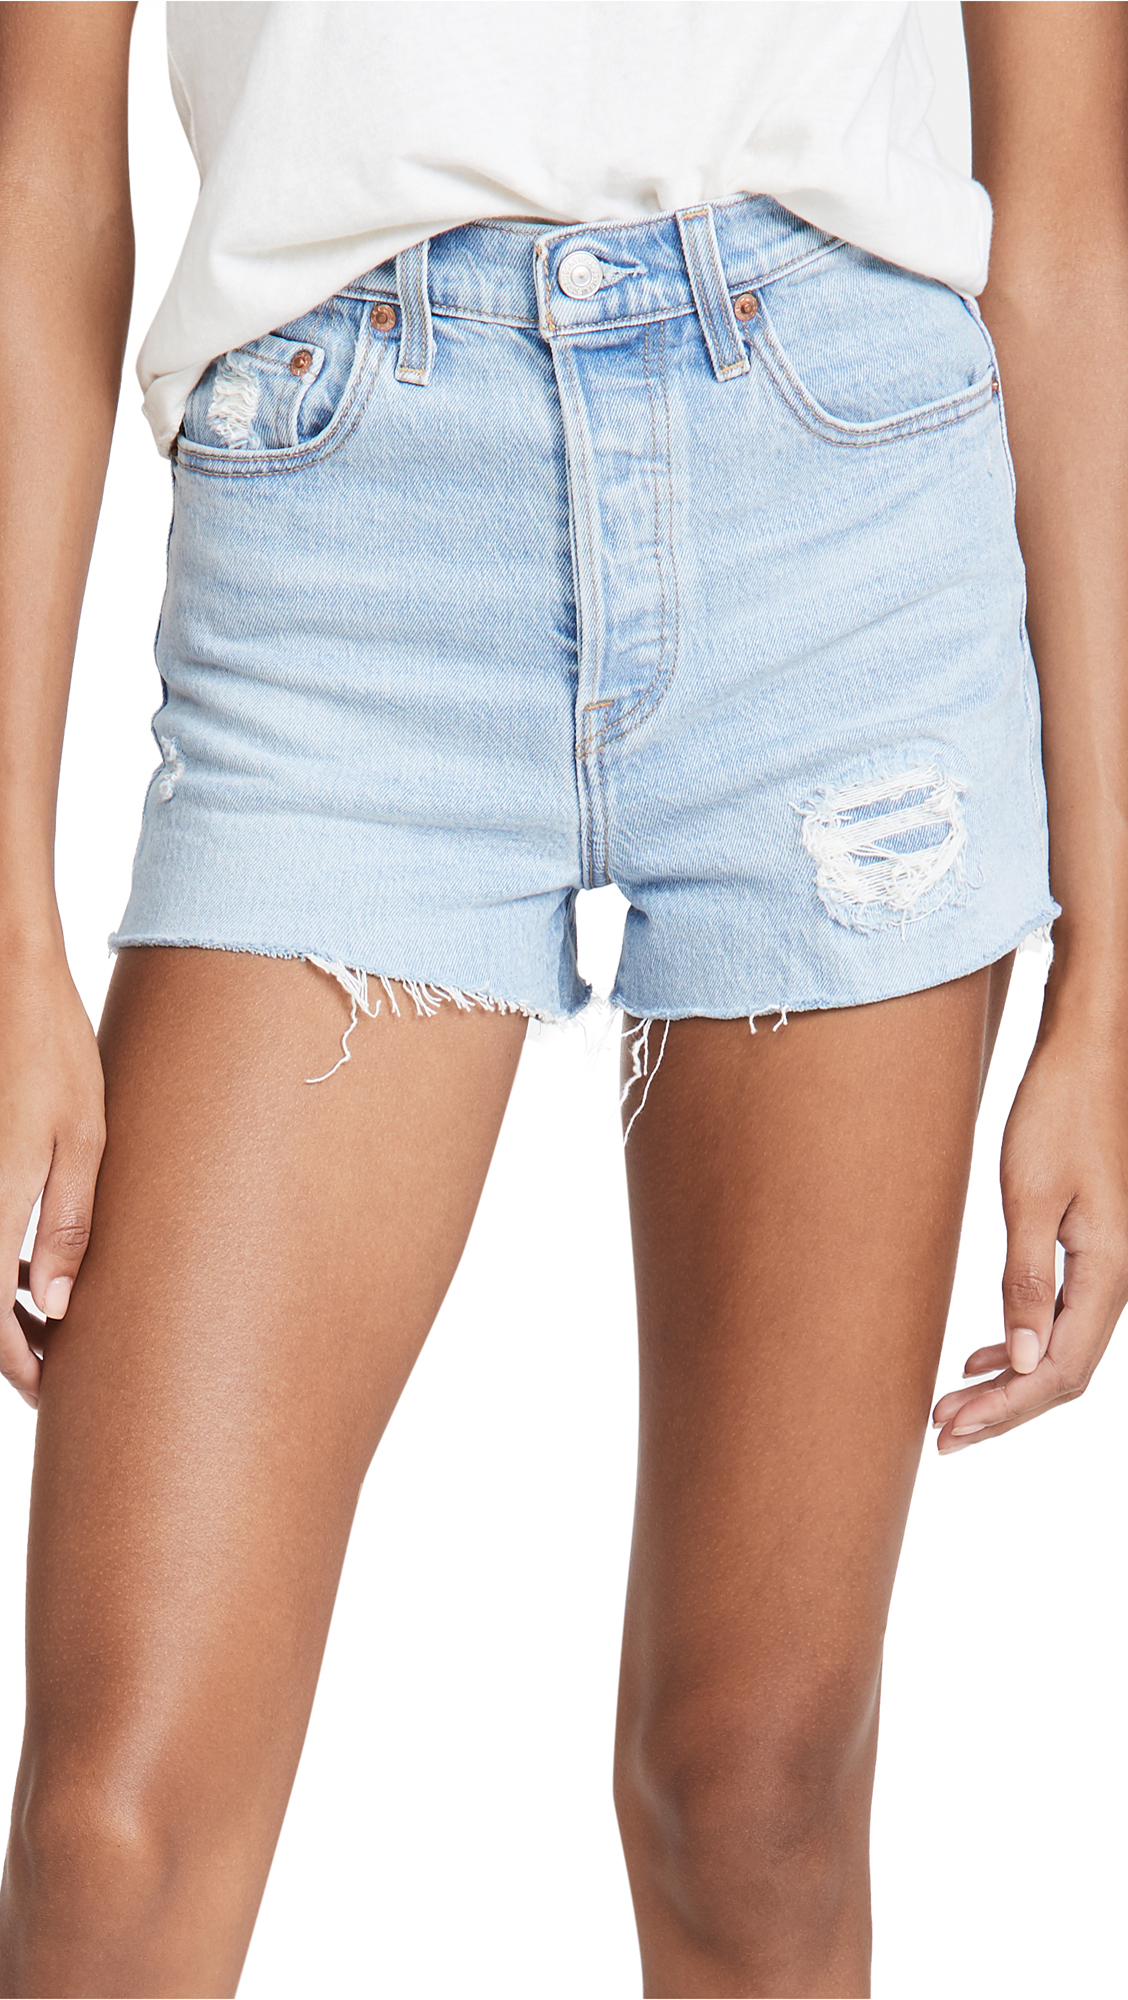 Levi's Ribcage Cutoff Shorts